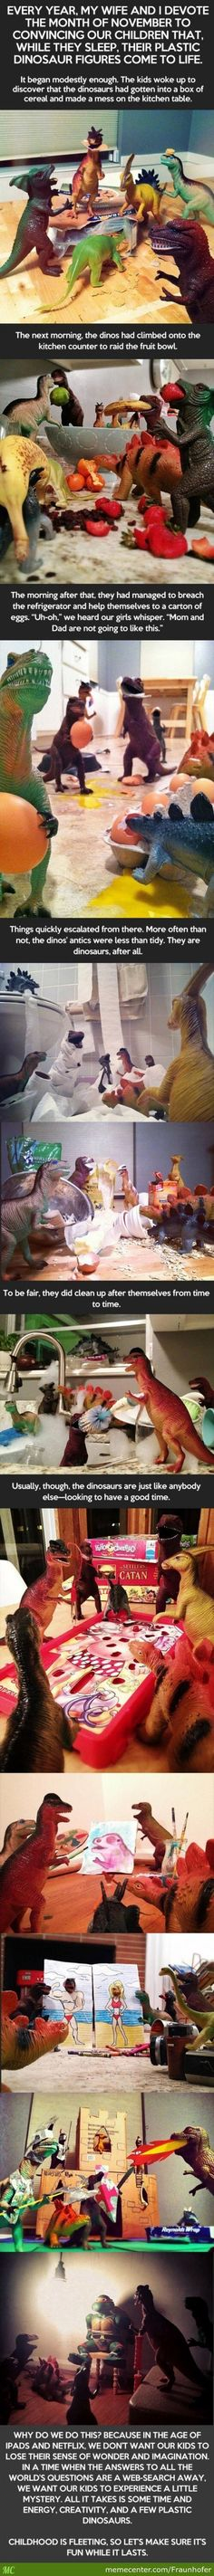 Naughty dinosaurs month ....